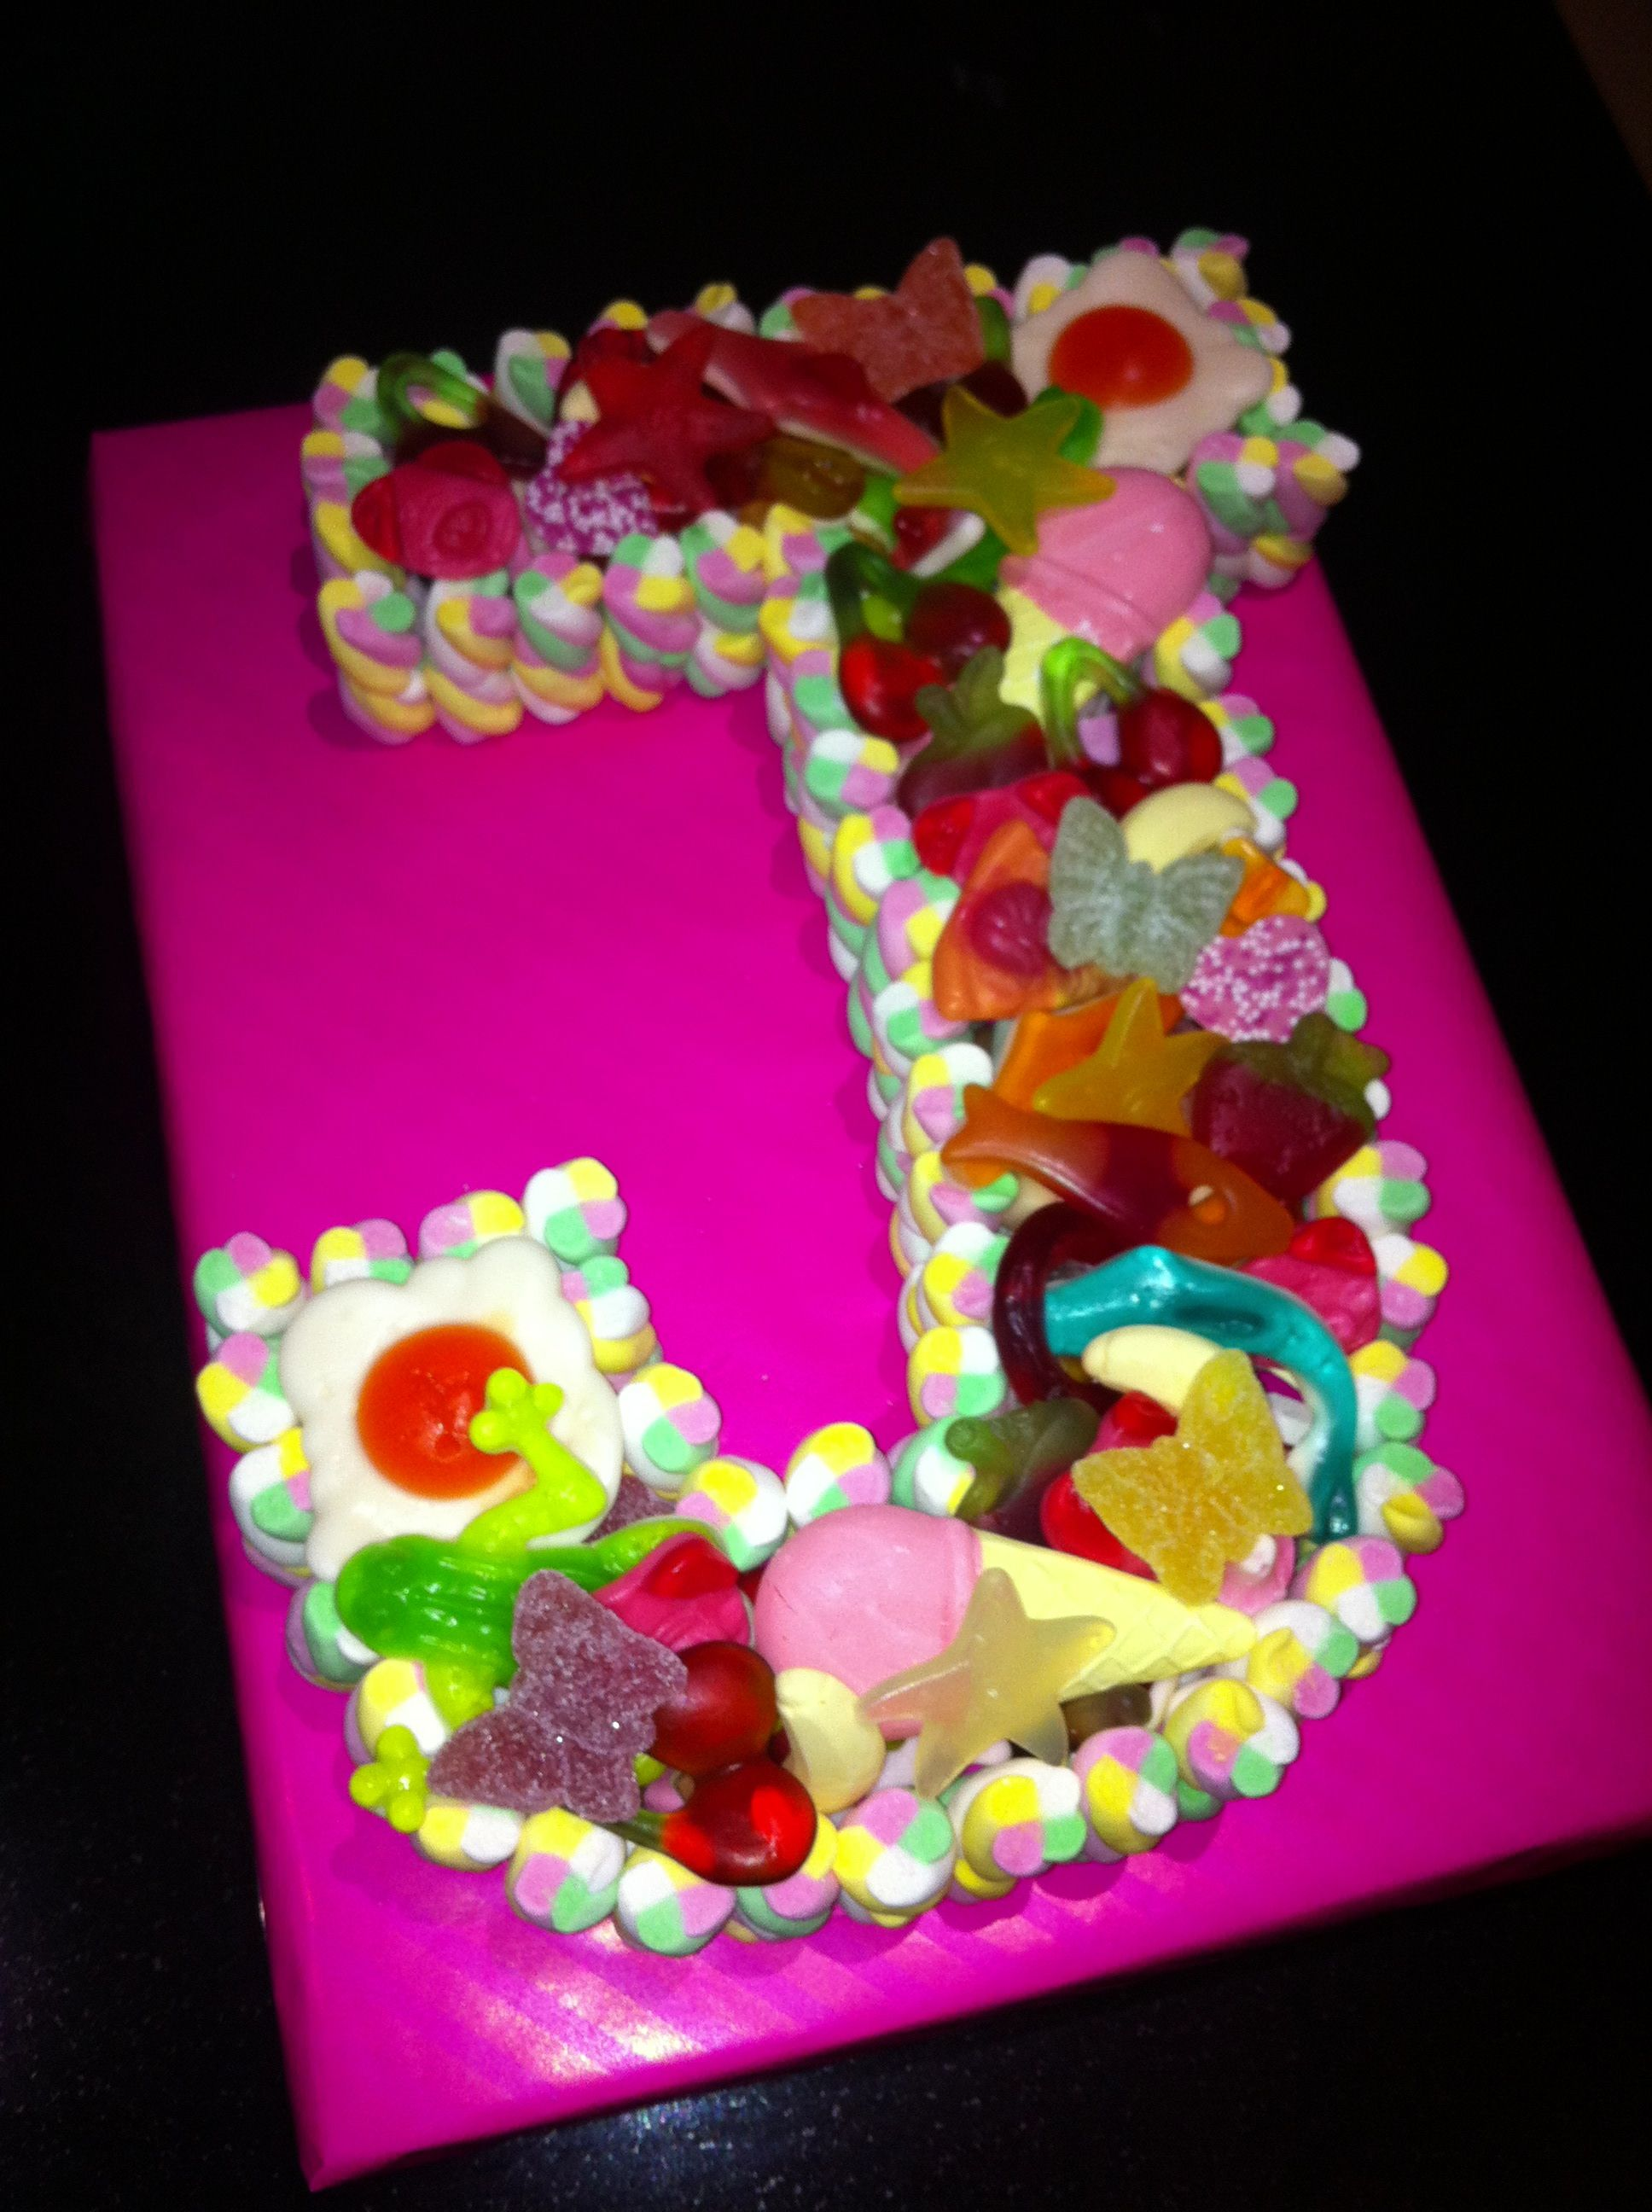 Pin By Jessica Pollard On Cake Boy Birthday Cake Cake Lettering Candy Birthday Cakes